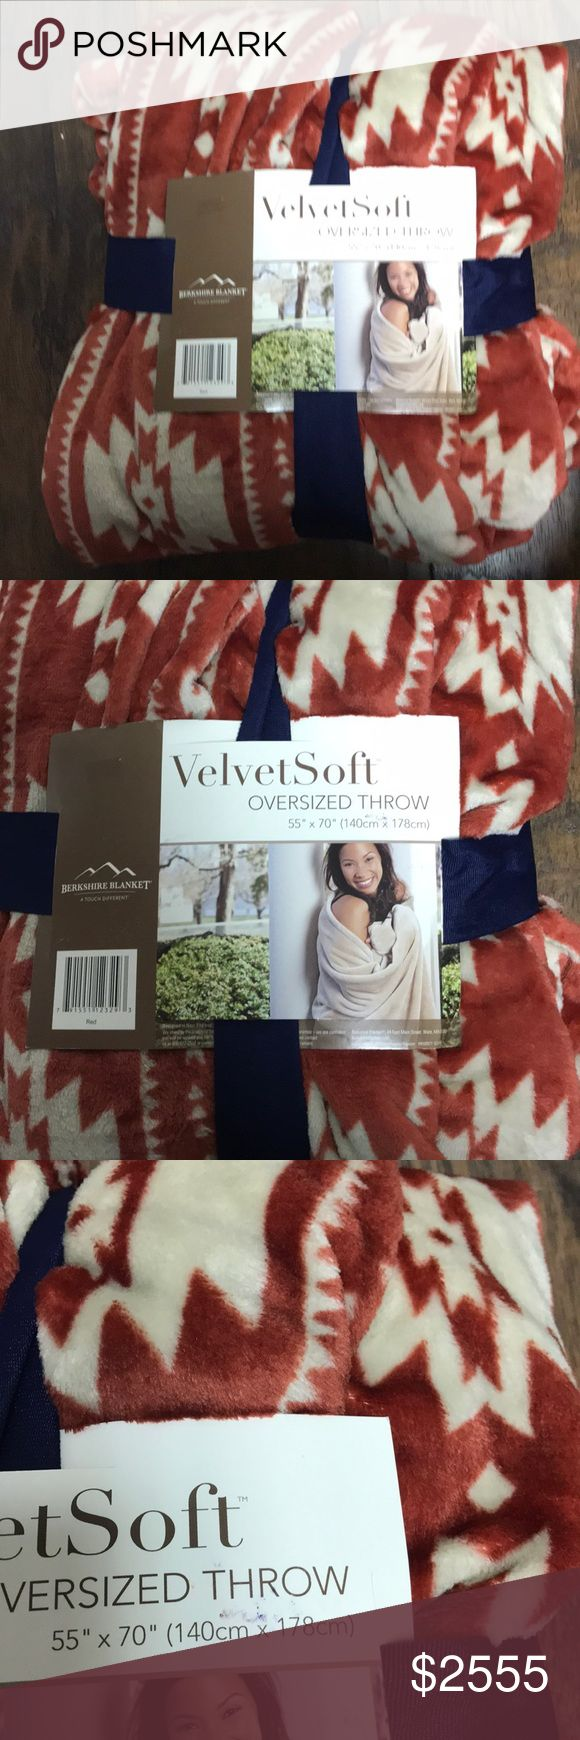 "Berkshire blanket throw - new Velvet soft oversized three 55"" x 70"" berkshire blanket Accessories"